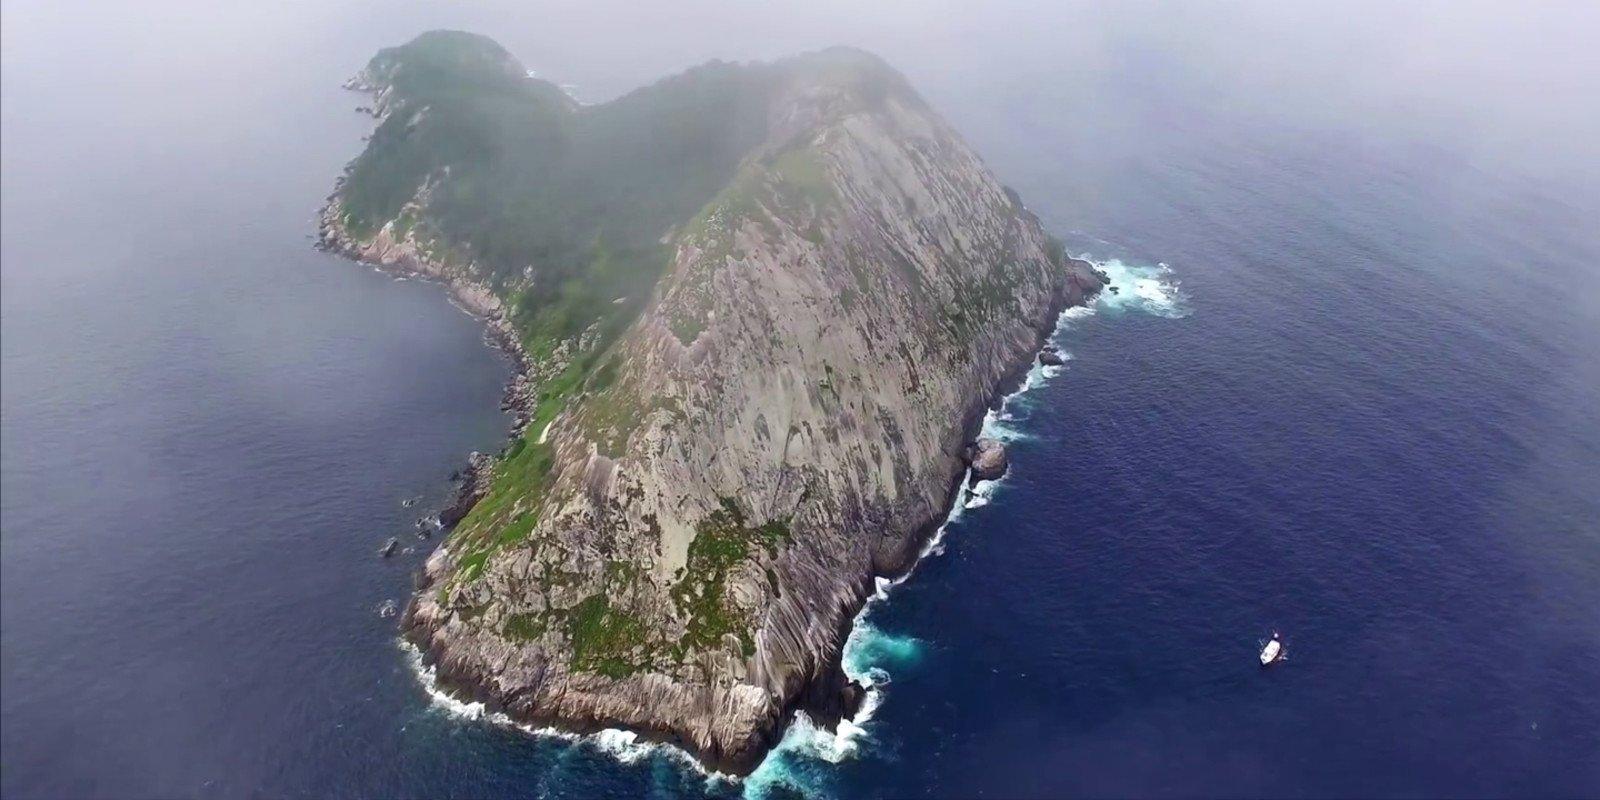 Isla de las cobras la isla ms peligrosa del mundo isla de las cobras altavistaventures Choice Image